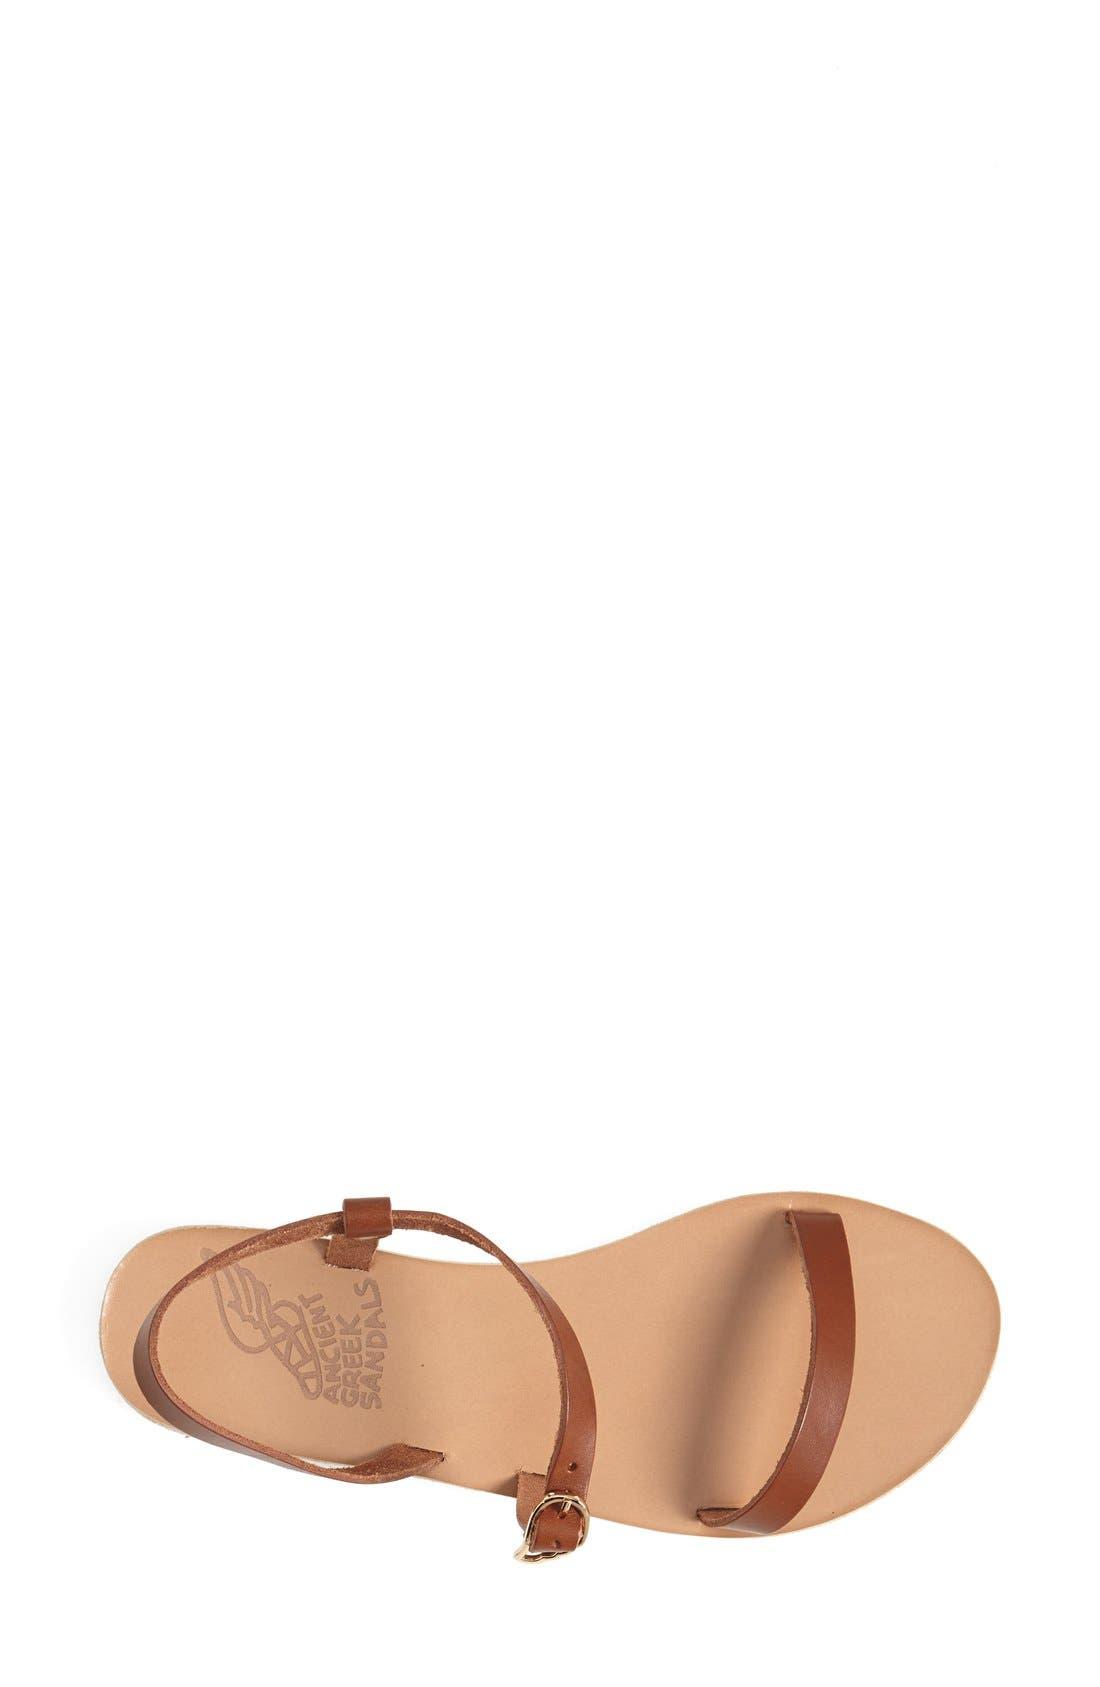 Alternate Image 3  - Ancient Greek Sandals 'Niove' Leather Sandal (Women)